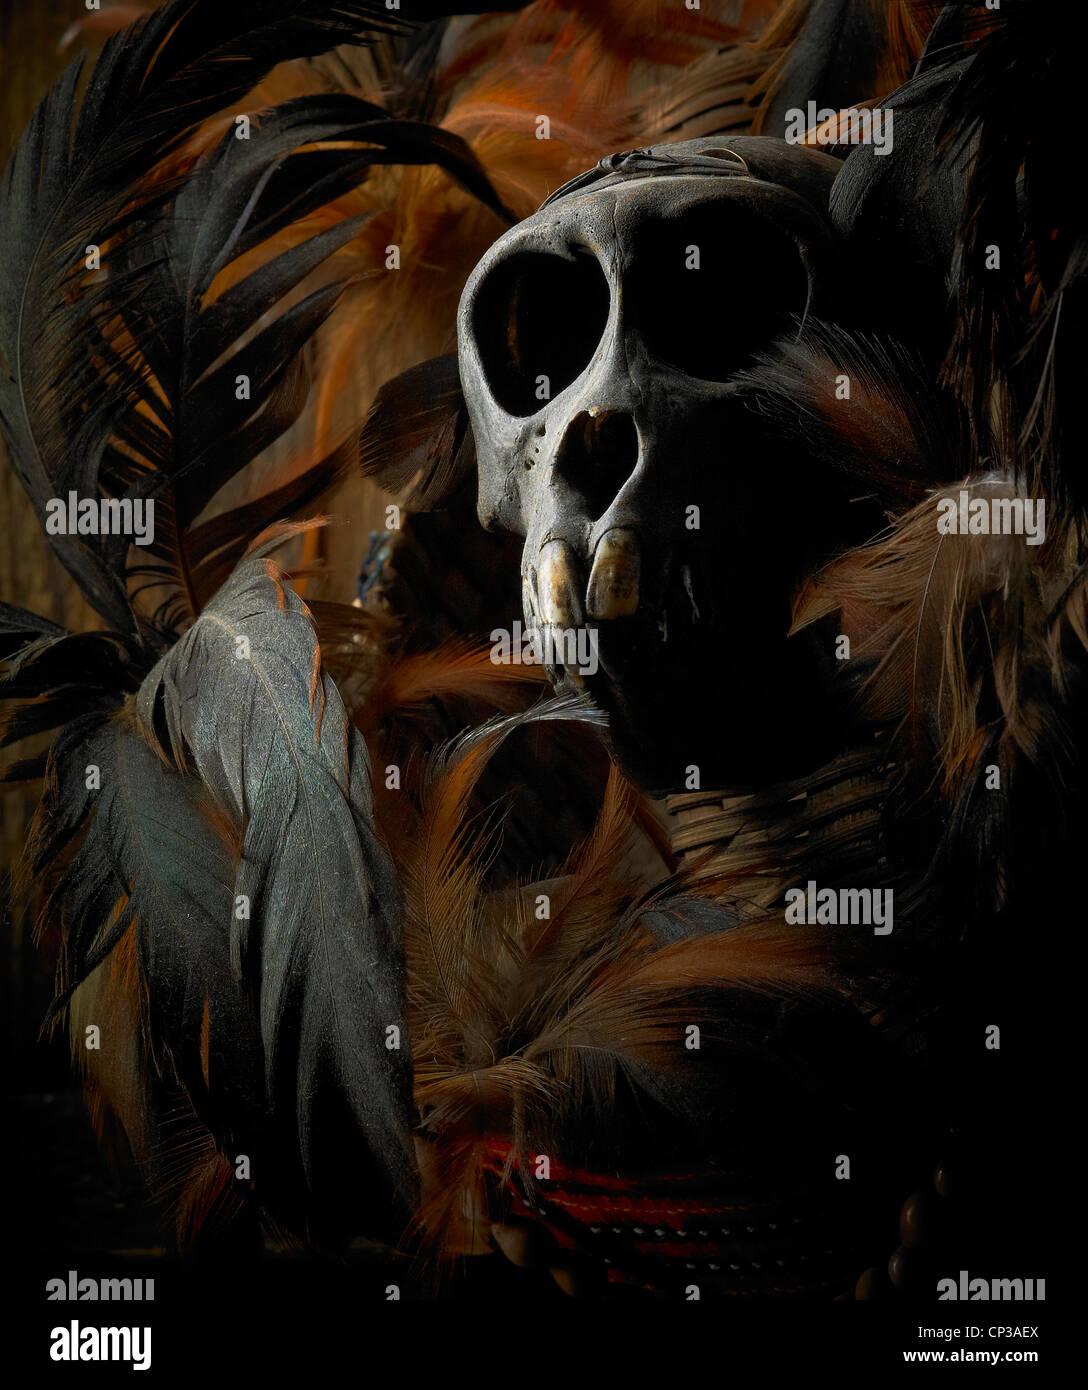 monkey skull and feathers - Stock Image